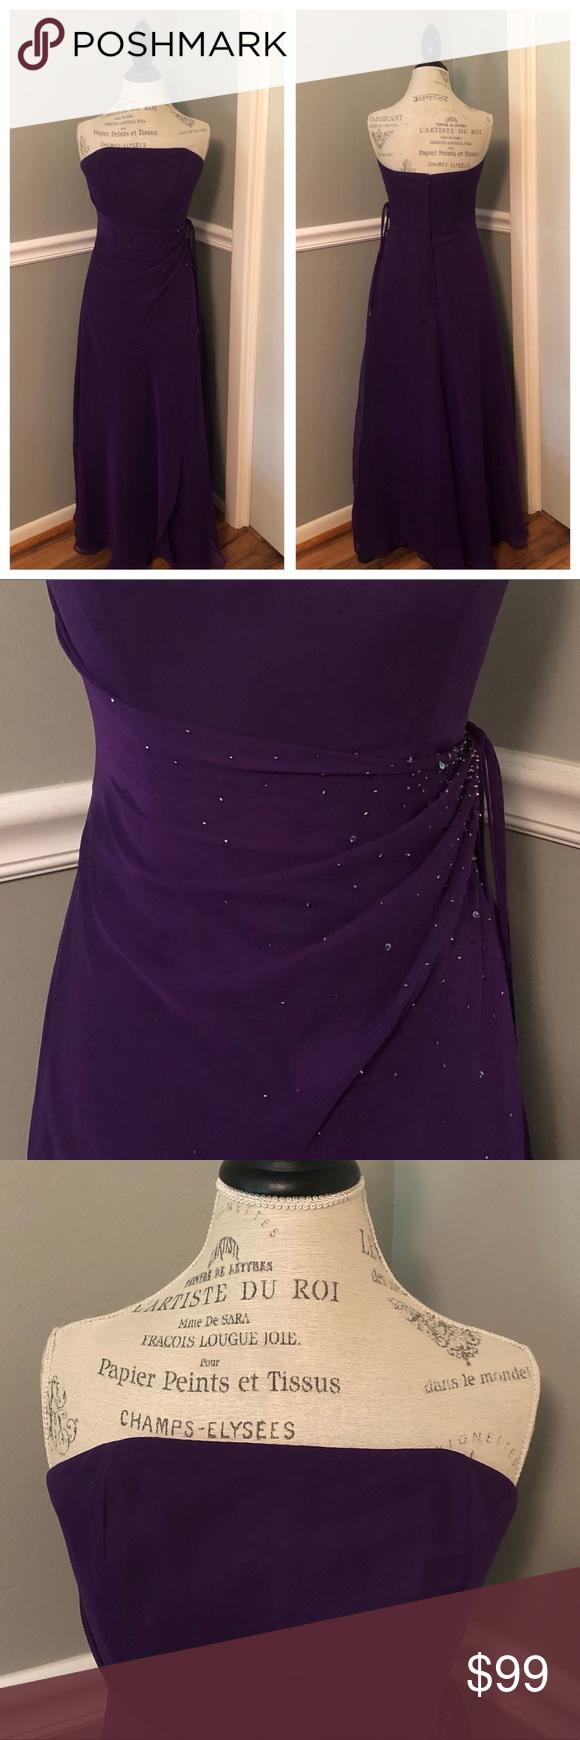 663dffb95eb2b NEW PURPLE STRAPLESS JEWELED BALL GOWN Gorgeous! 💫💫💫 NWOT Purple  Strapless Chiffon Formal